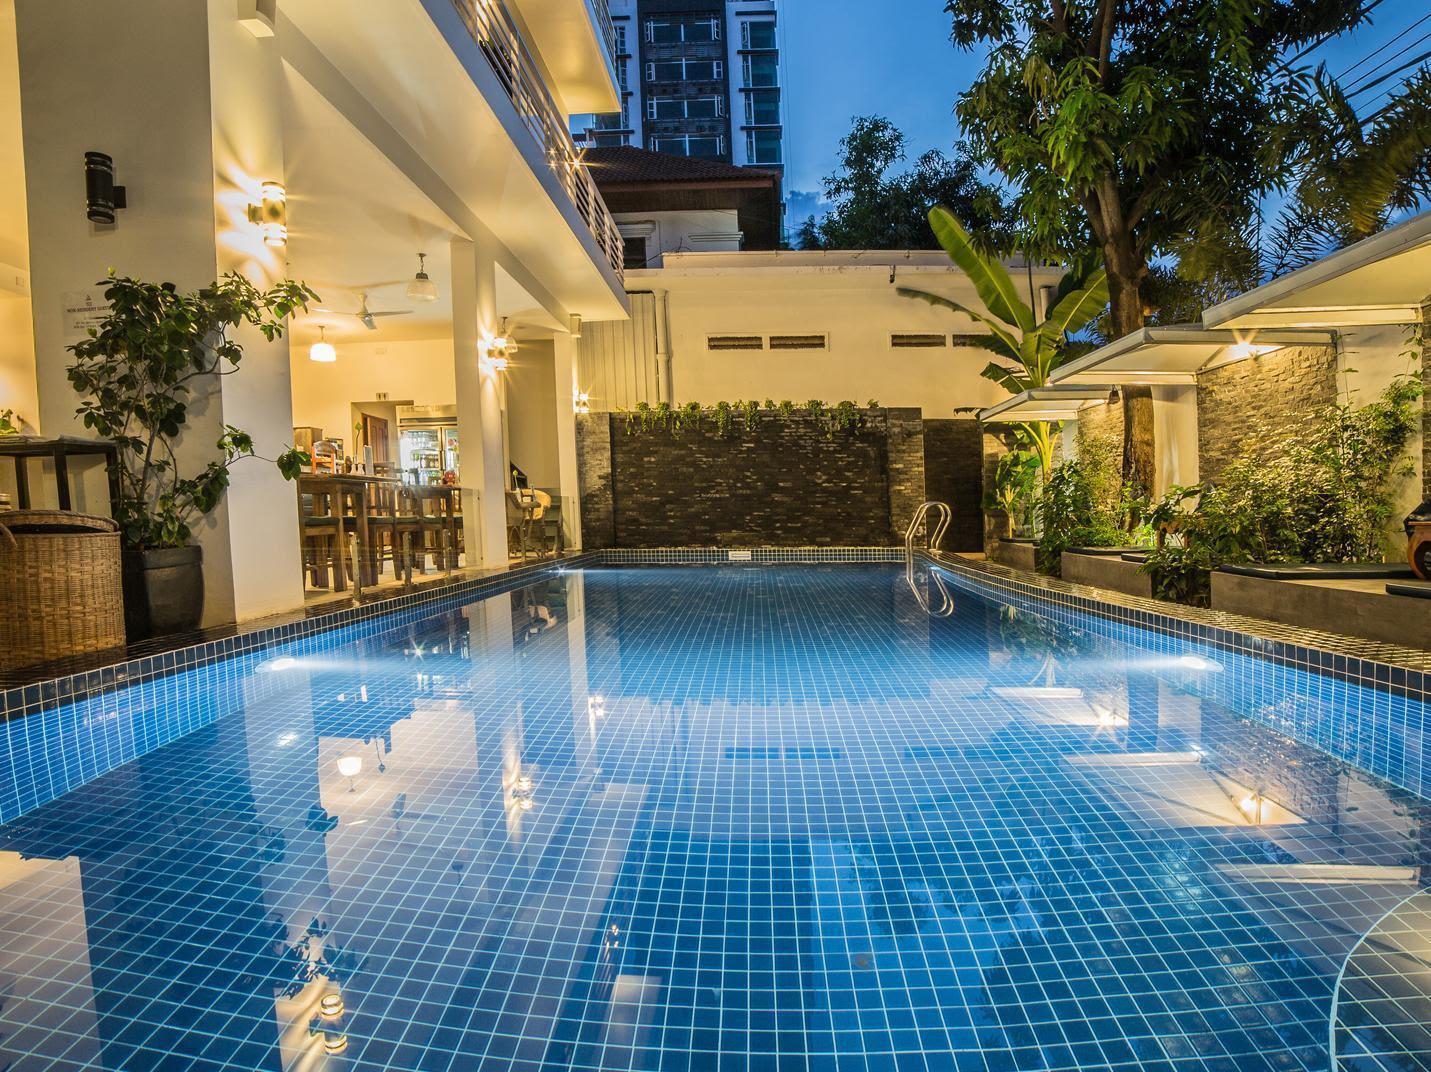 Anise Villa Boutique Hotel, Phnom Penh Reviews